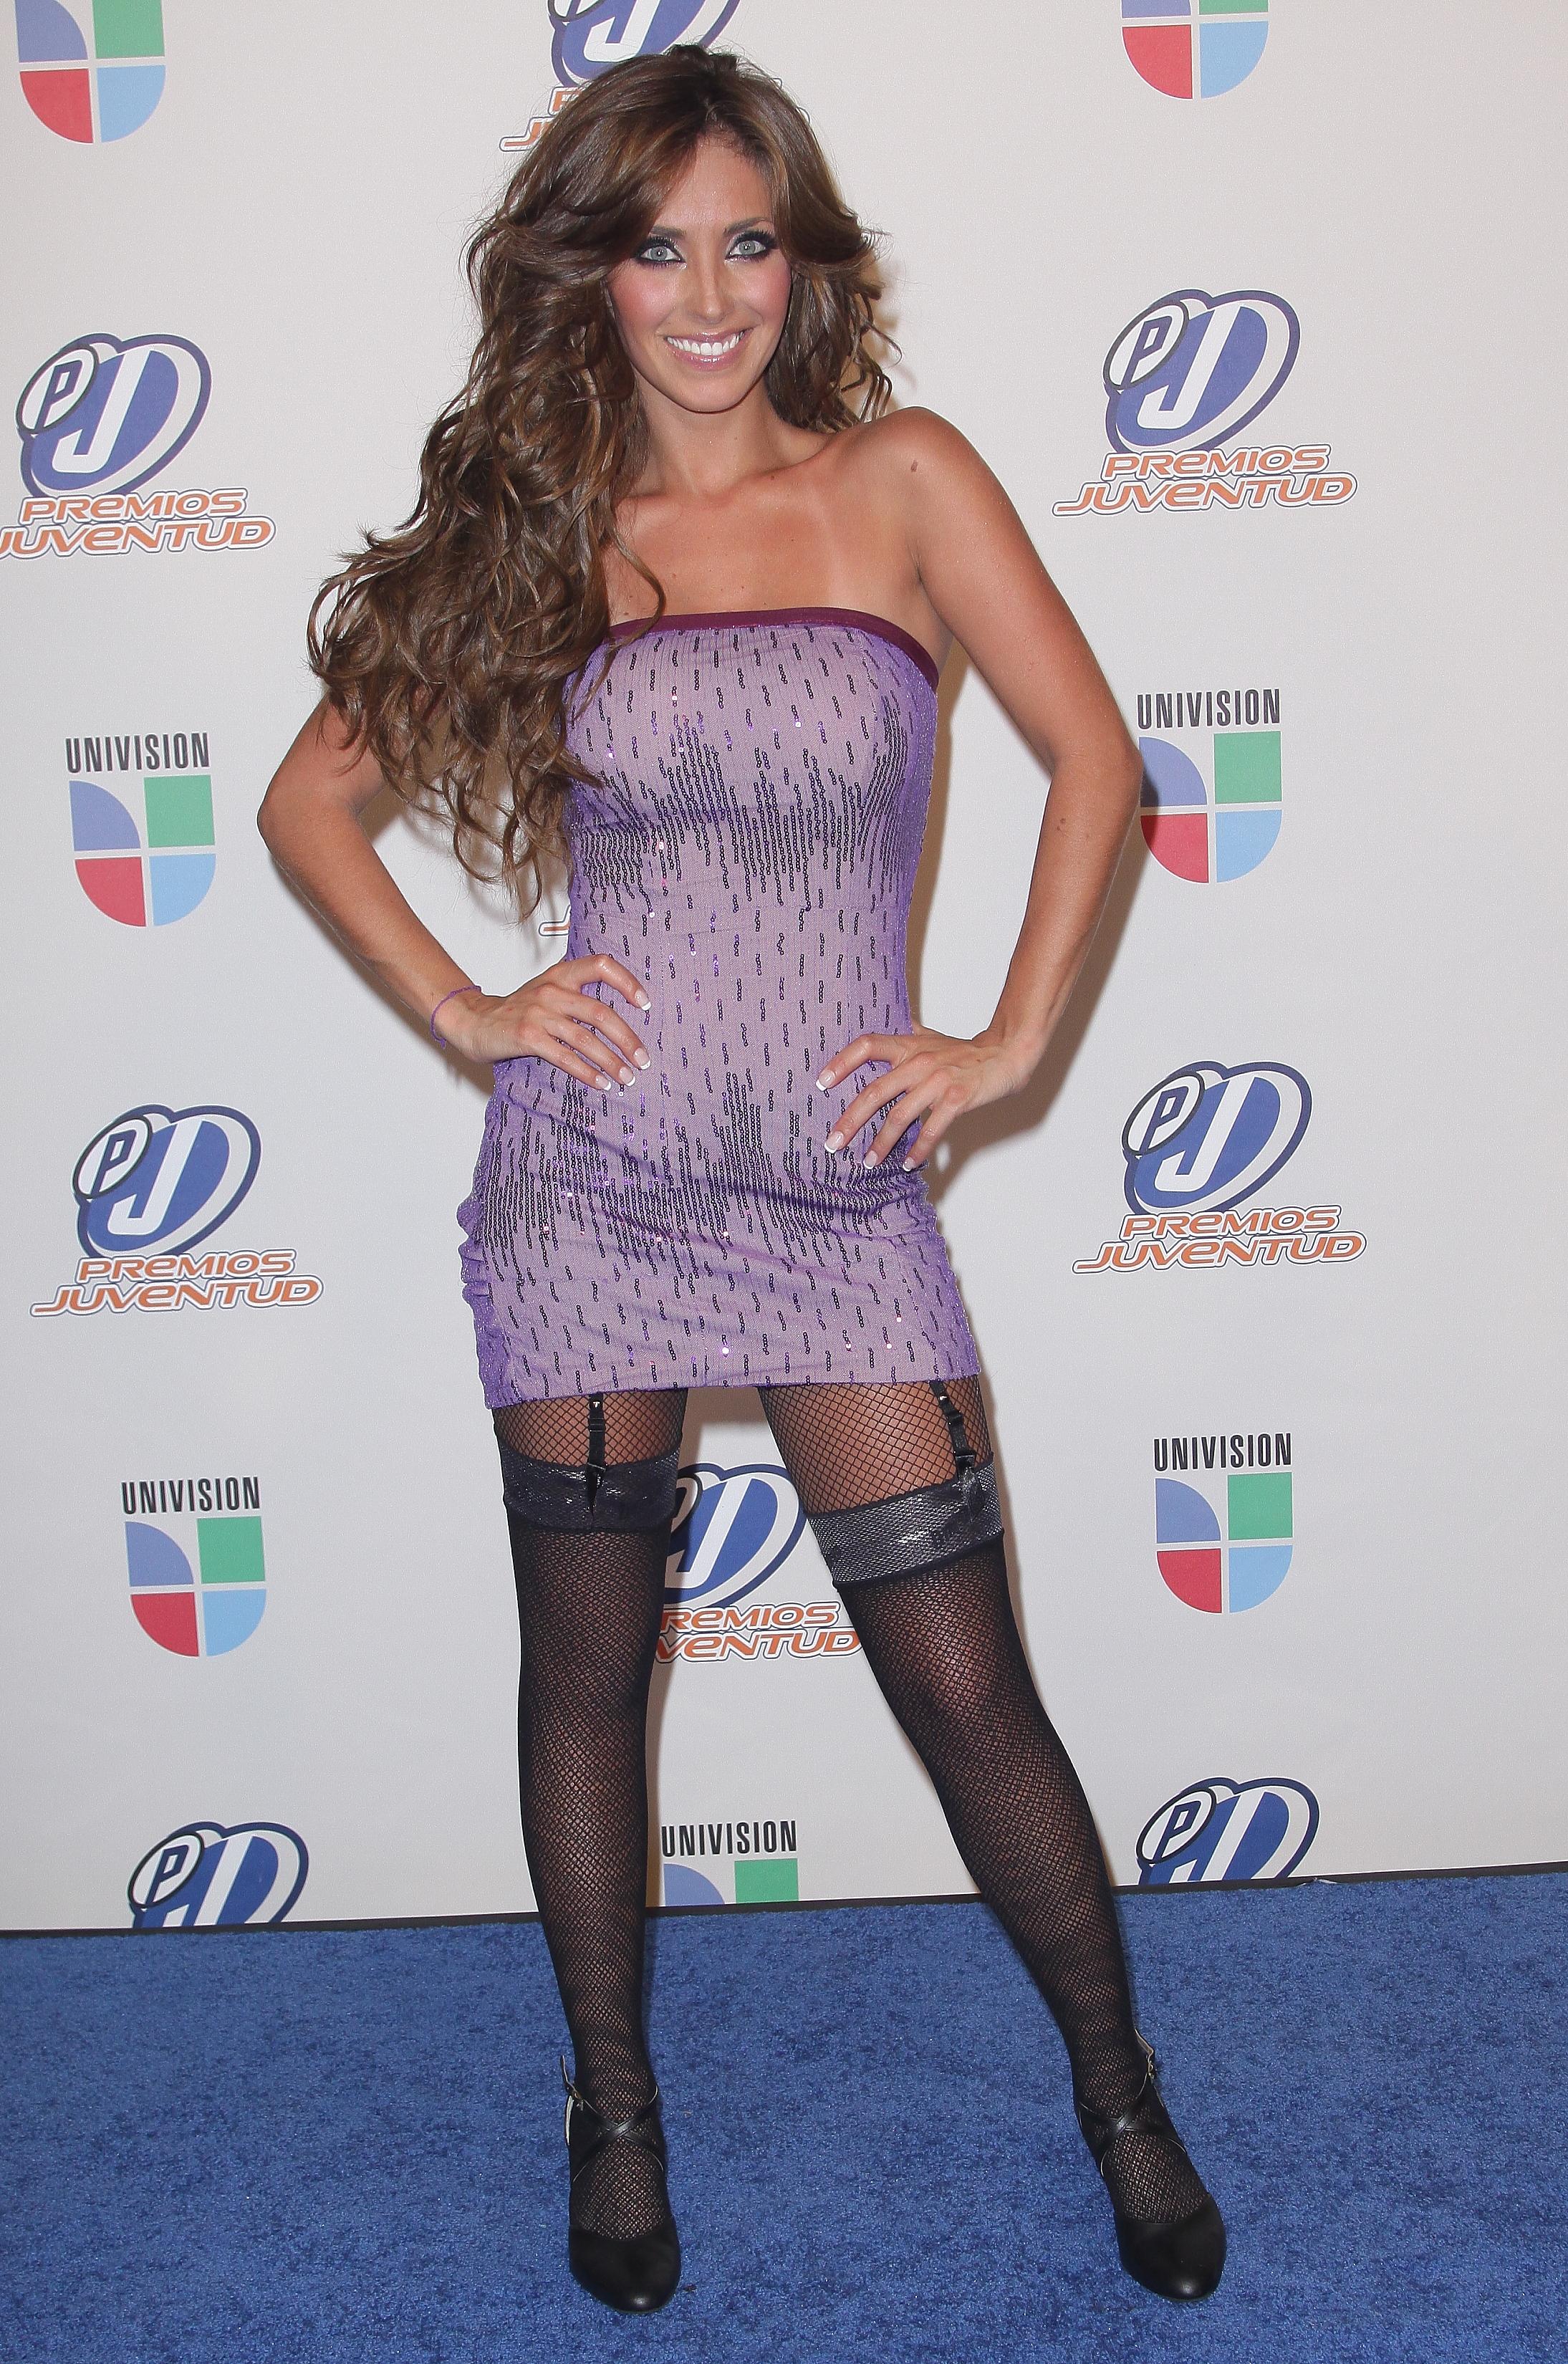 Univisions 2009 Premios Juventud - Press Room